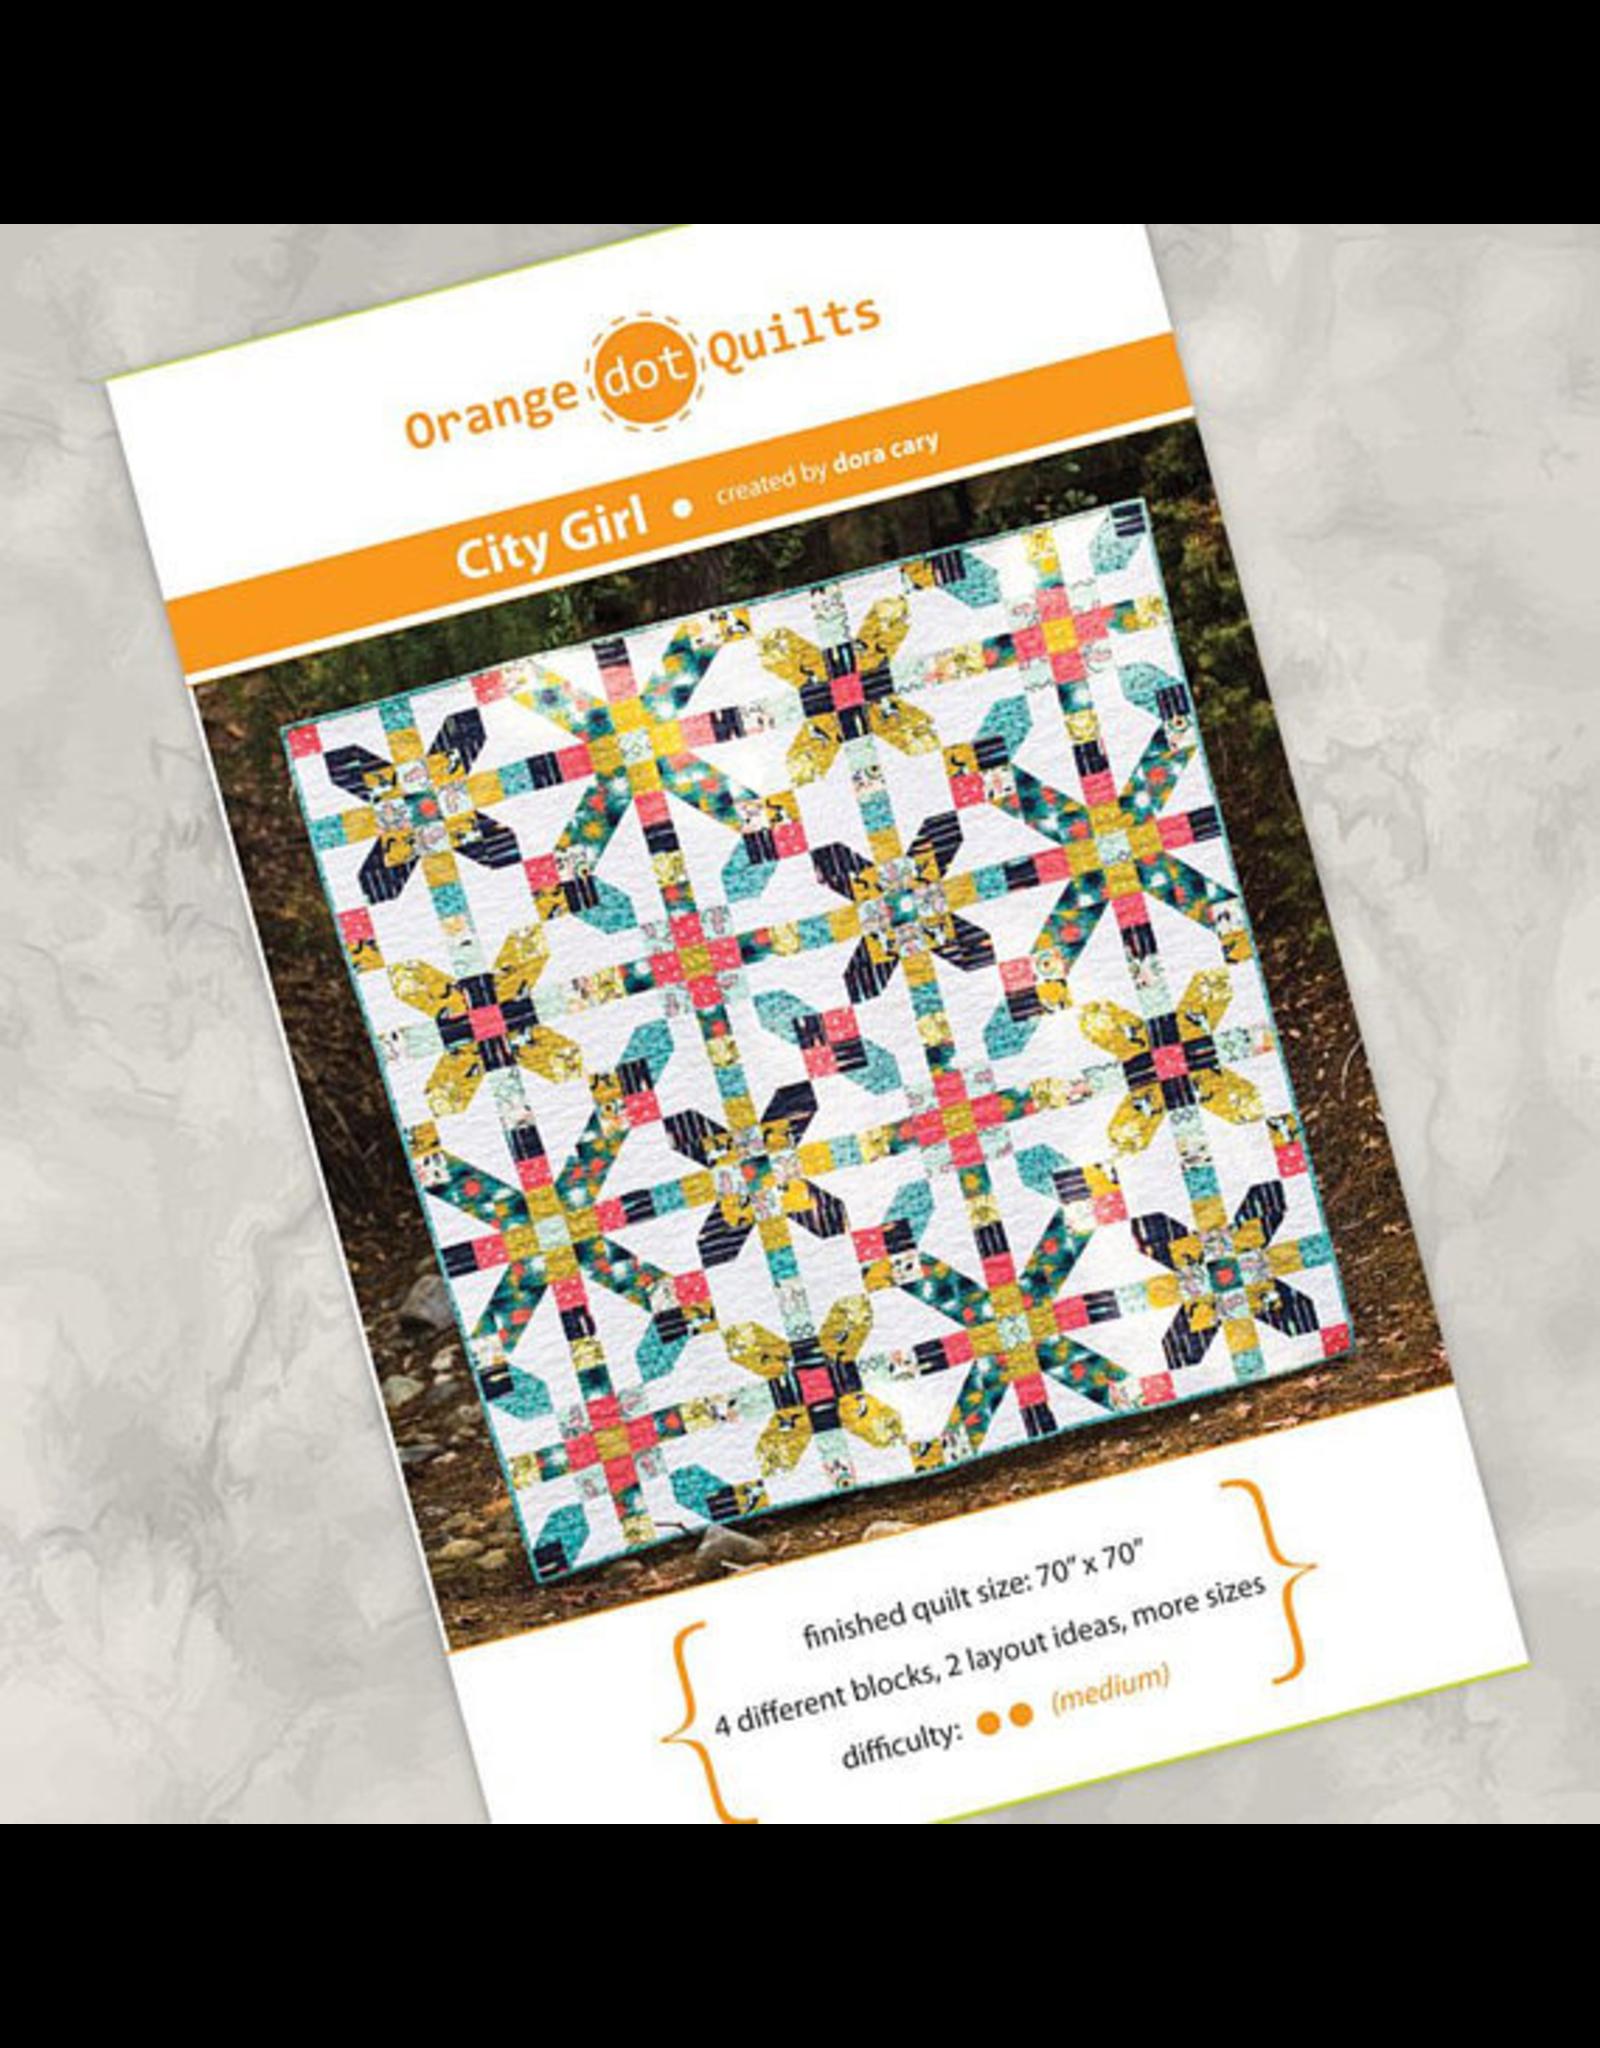 Orange Dot Quilts City Girl Quilt Pattern